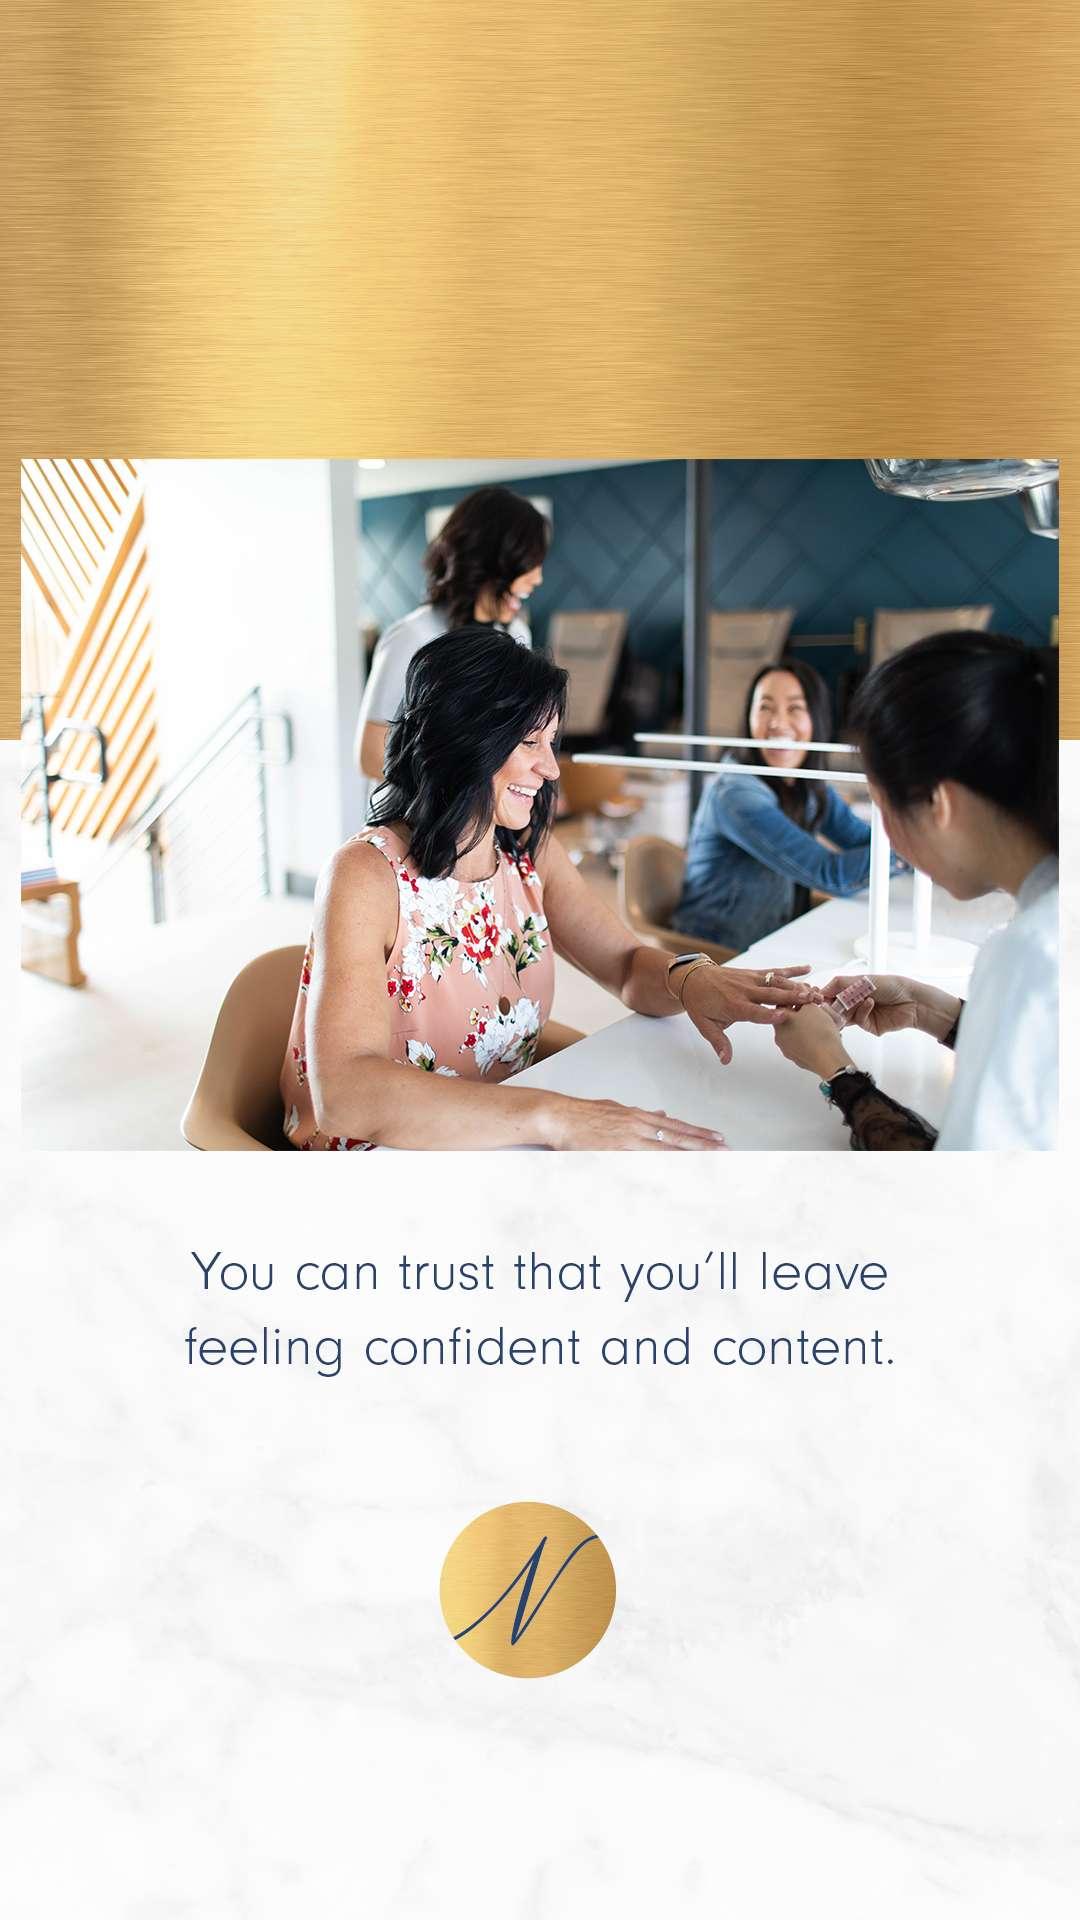 Mabble Media - Creative Agency   Nirvana Beauty Lounge Logo   Website   Photography   Social Strategy   Copywriting   SEO - Graphic